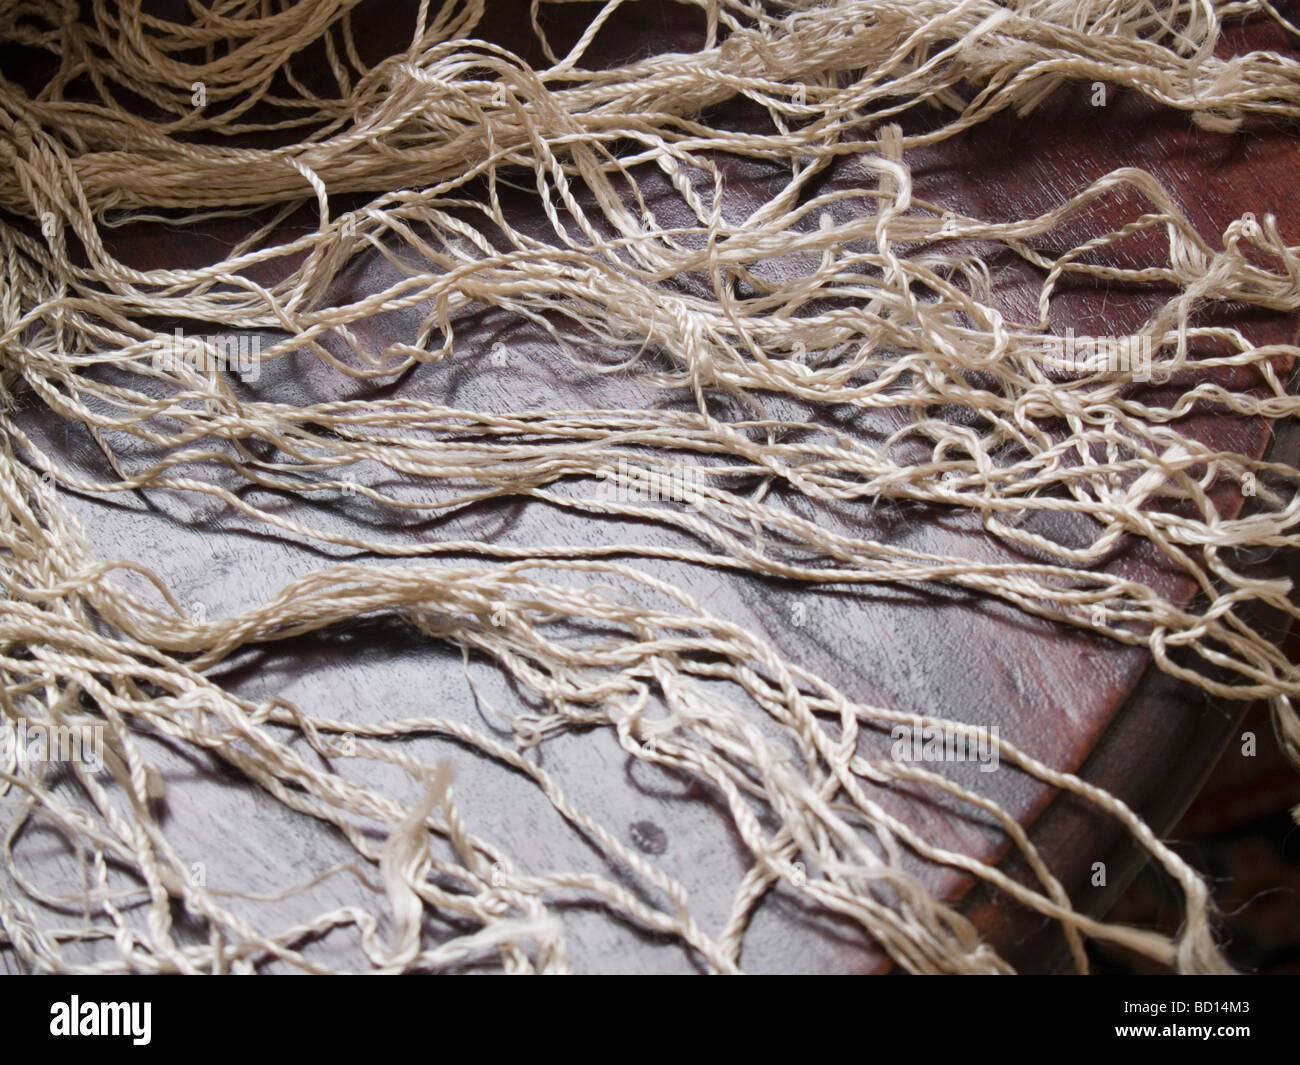 Jewish ritual objects Tallis or prayer shawl in museum in historic desert Synagogue in Tucson Arizona - Stock Image